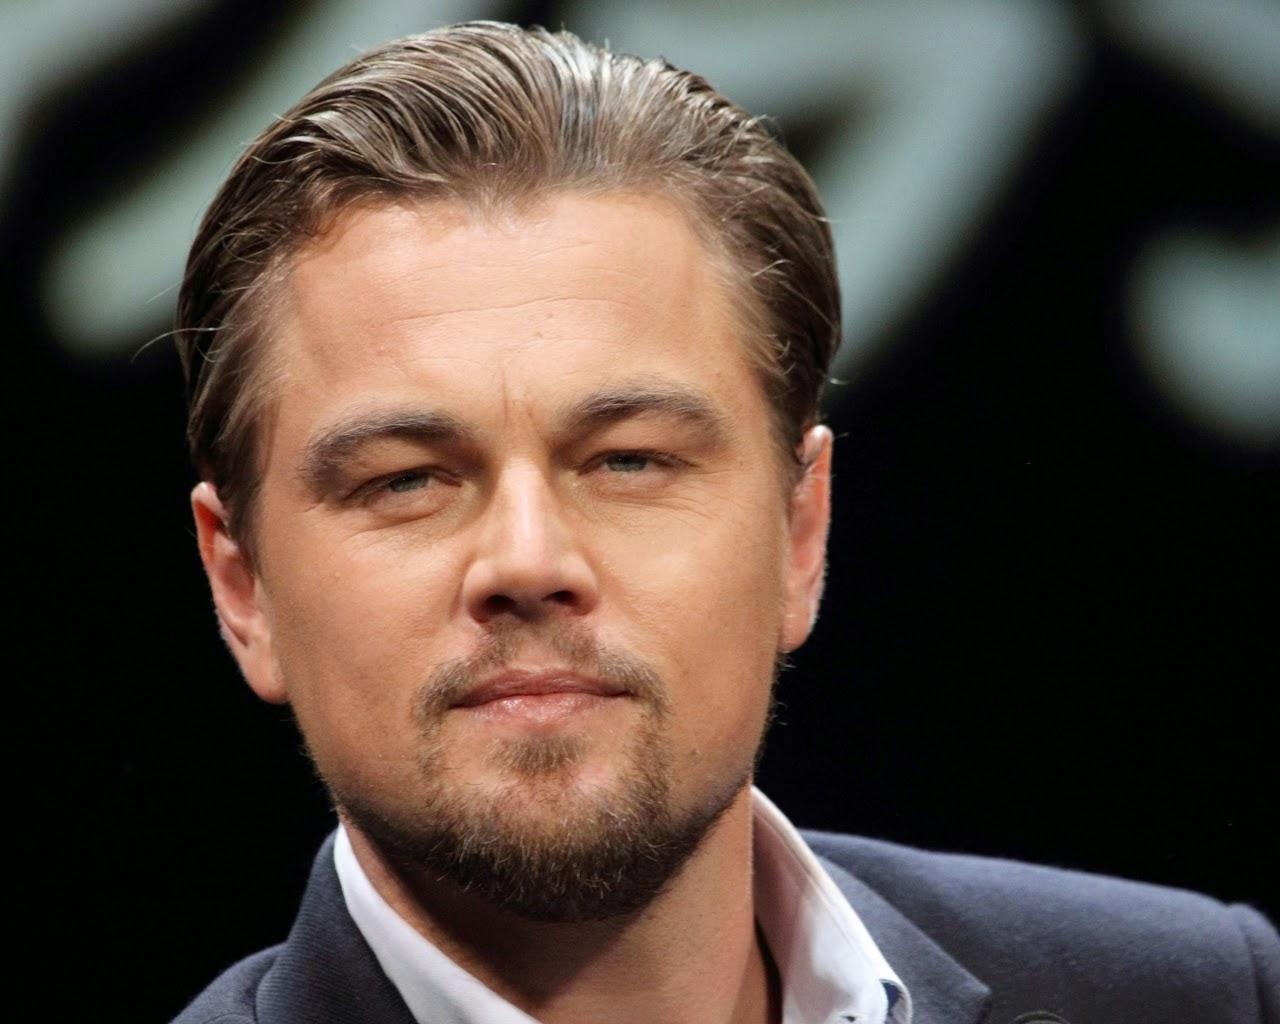 Leonardo DiCaprio protagonizará 'The Revenant'. MÁS CINE. Making Of. Noticias